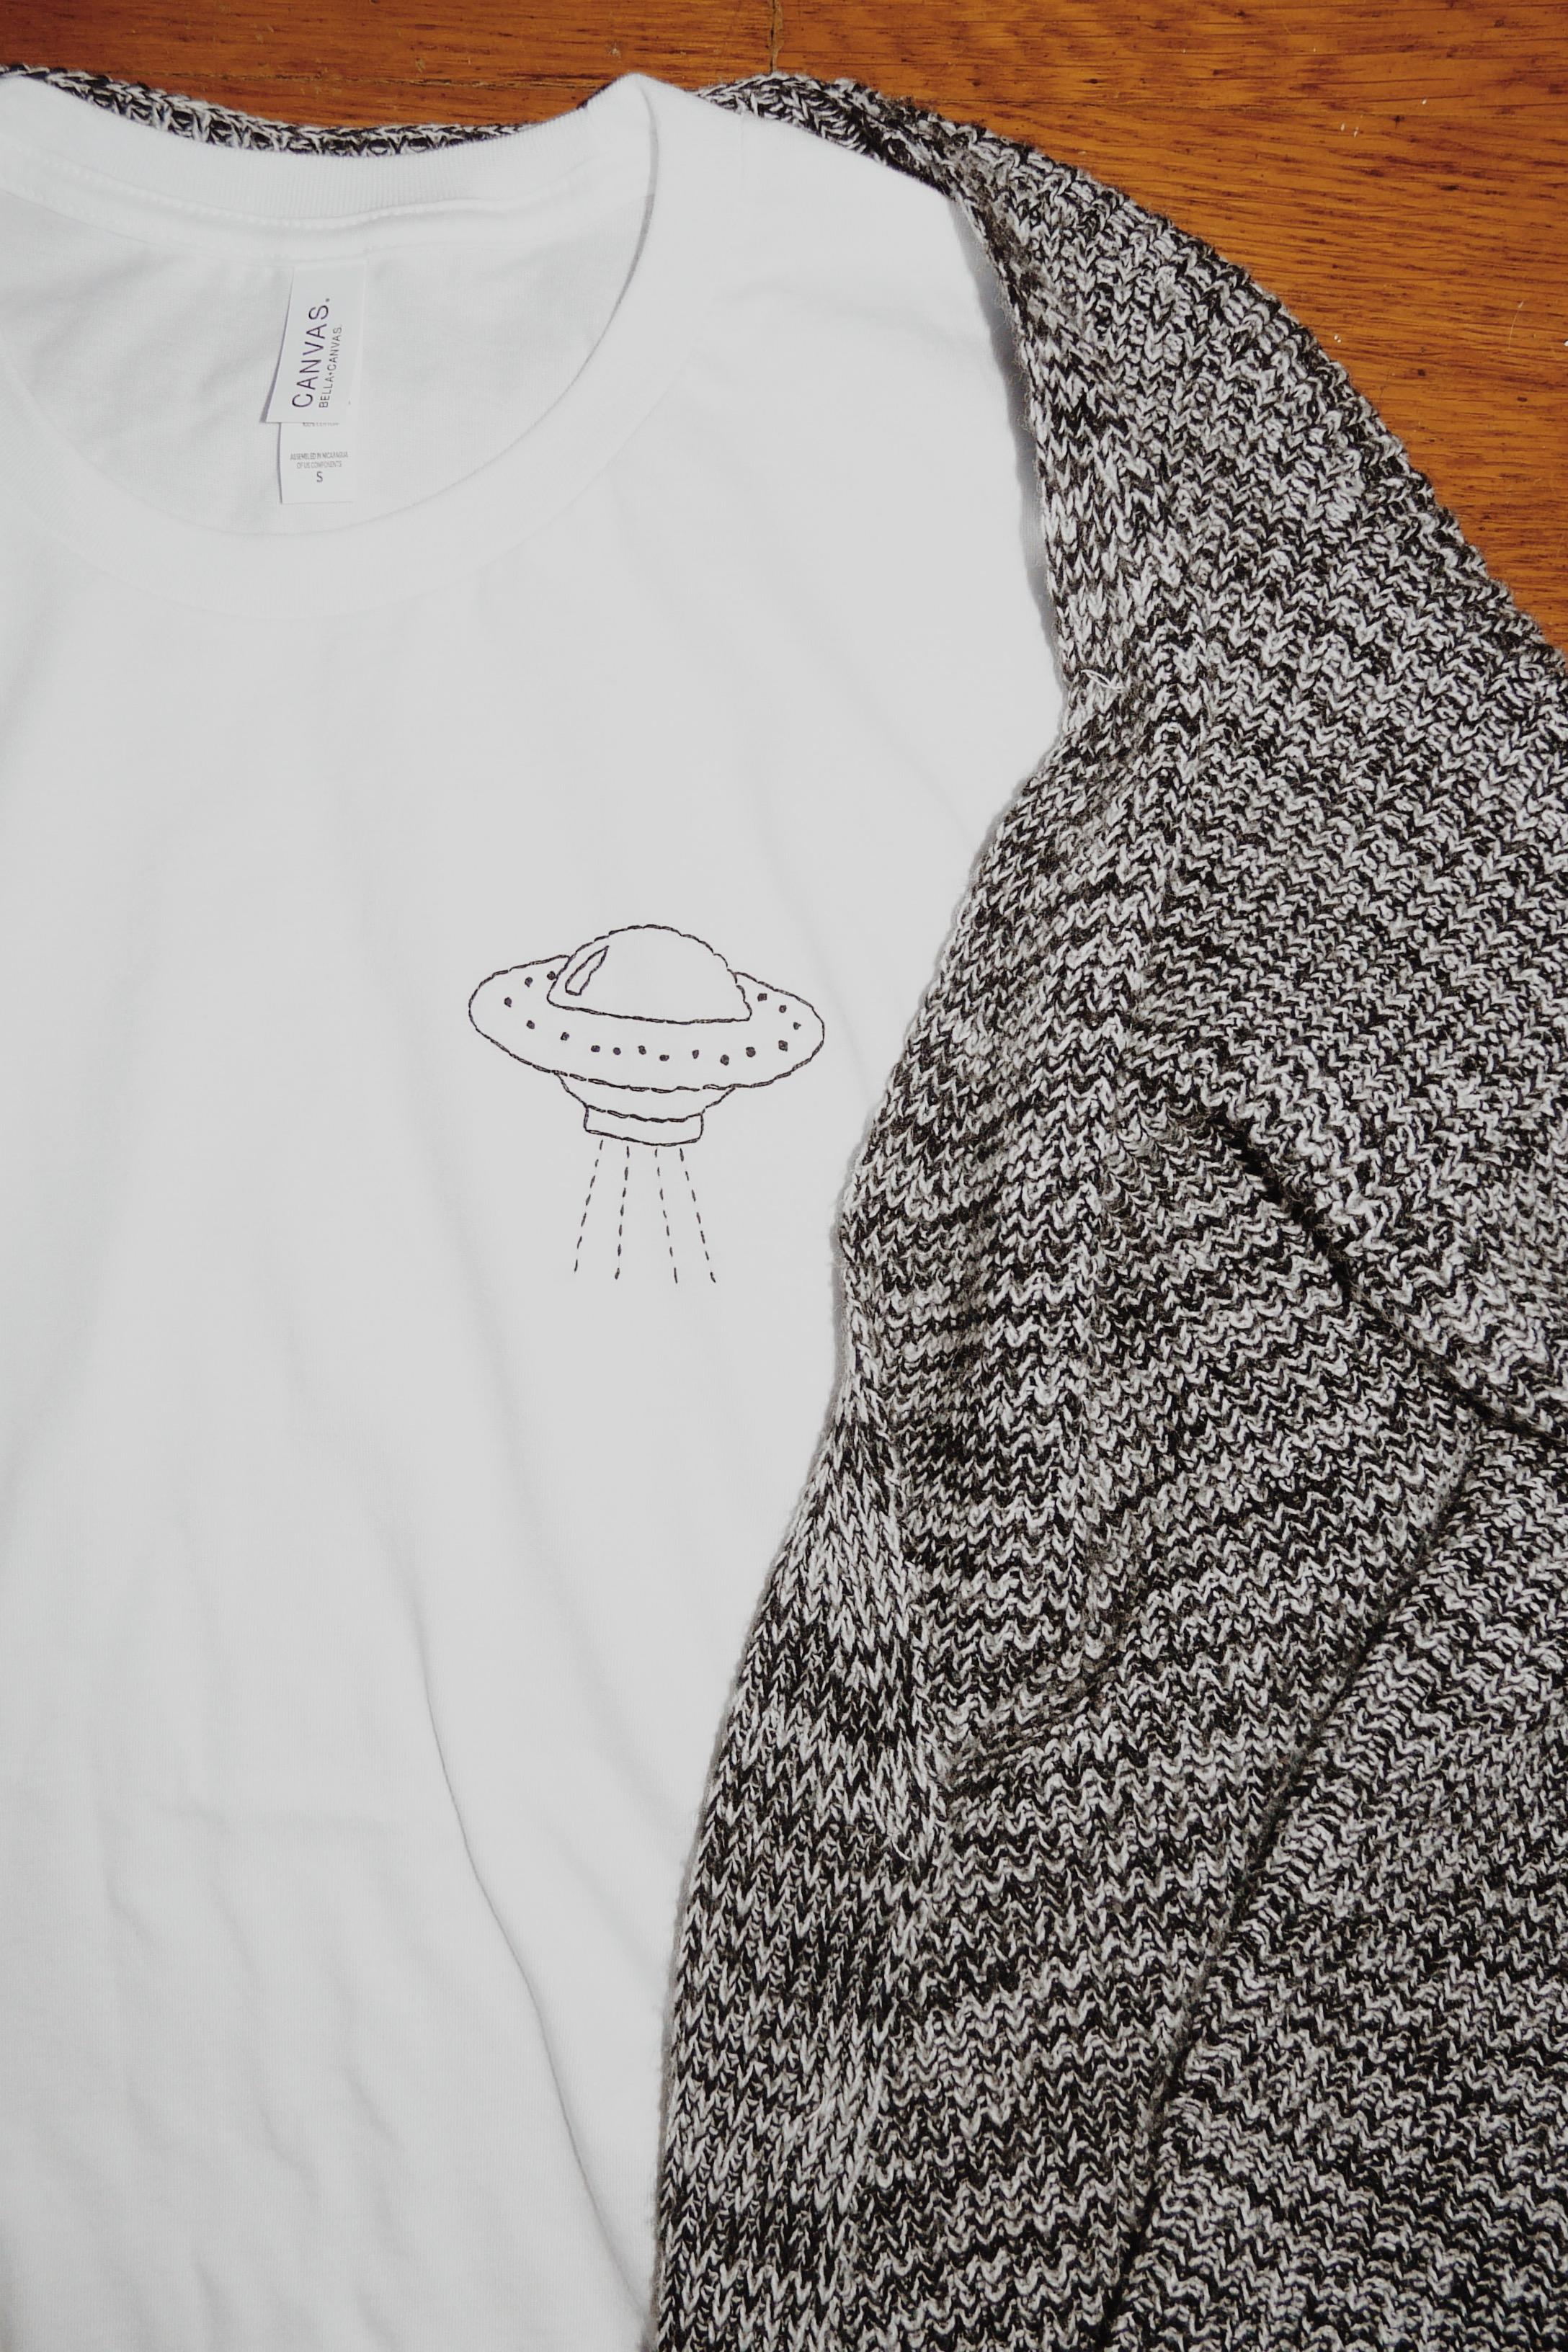 Packing Blog UFO t-shirt